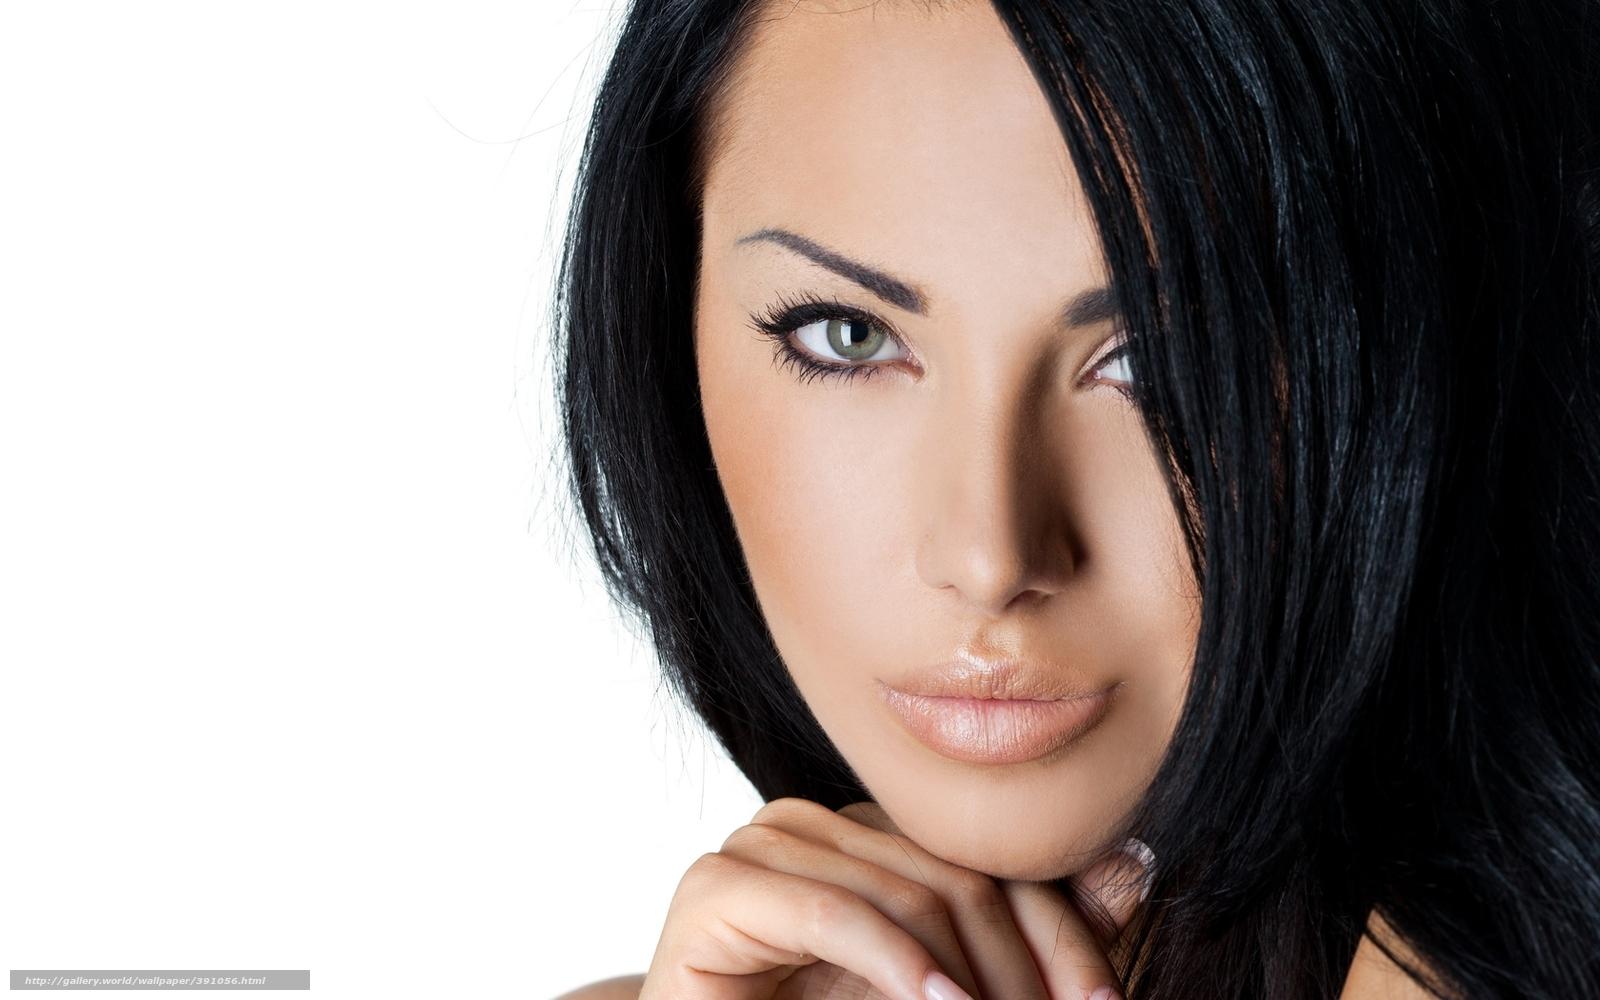 Стрижки девушек брюнеток лицо 14 фотография